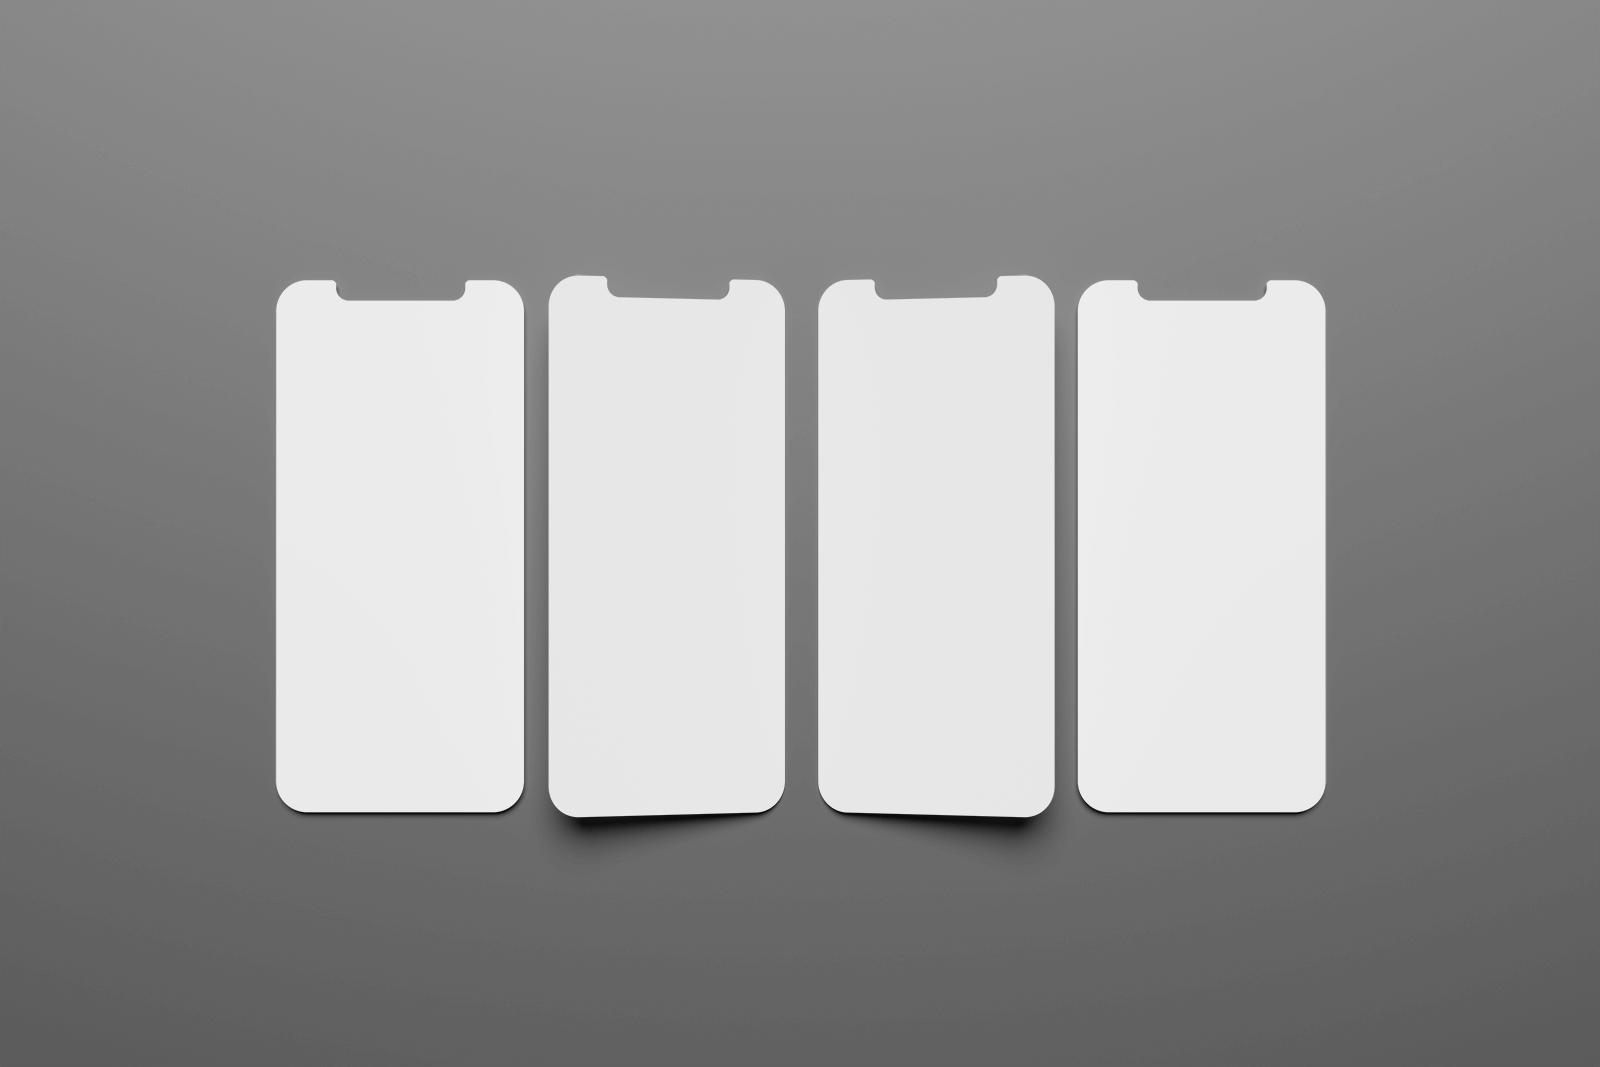 Free iPhone UI Screens Mockup Set